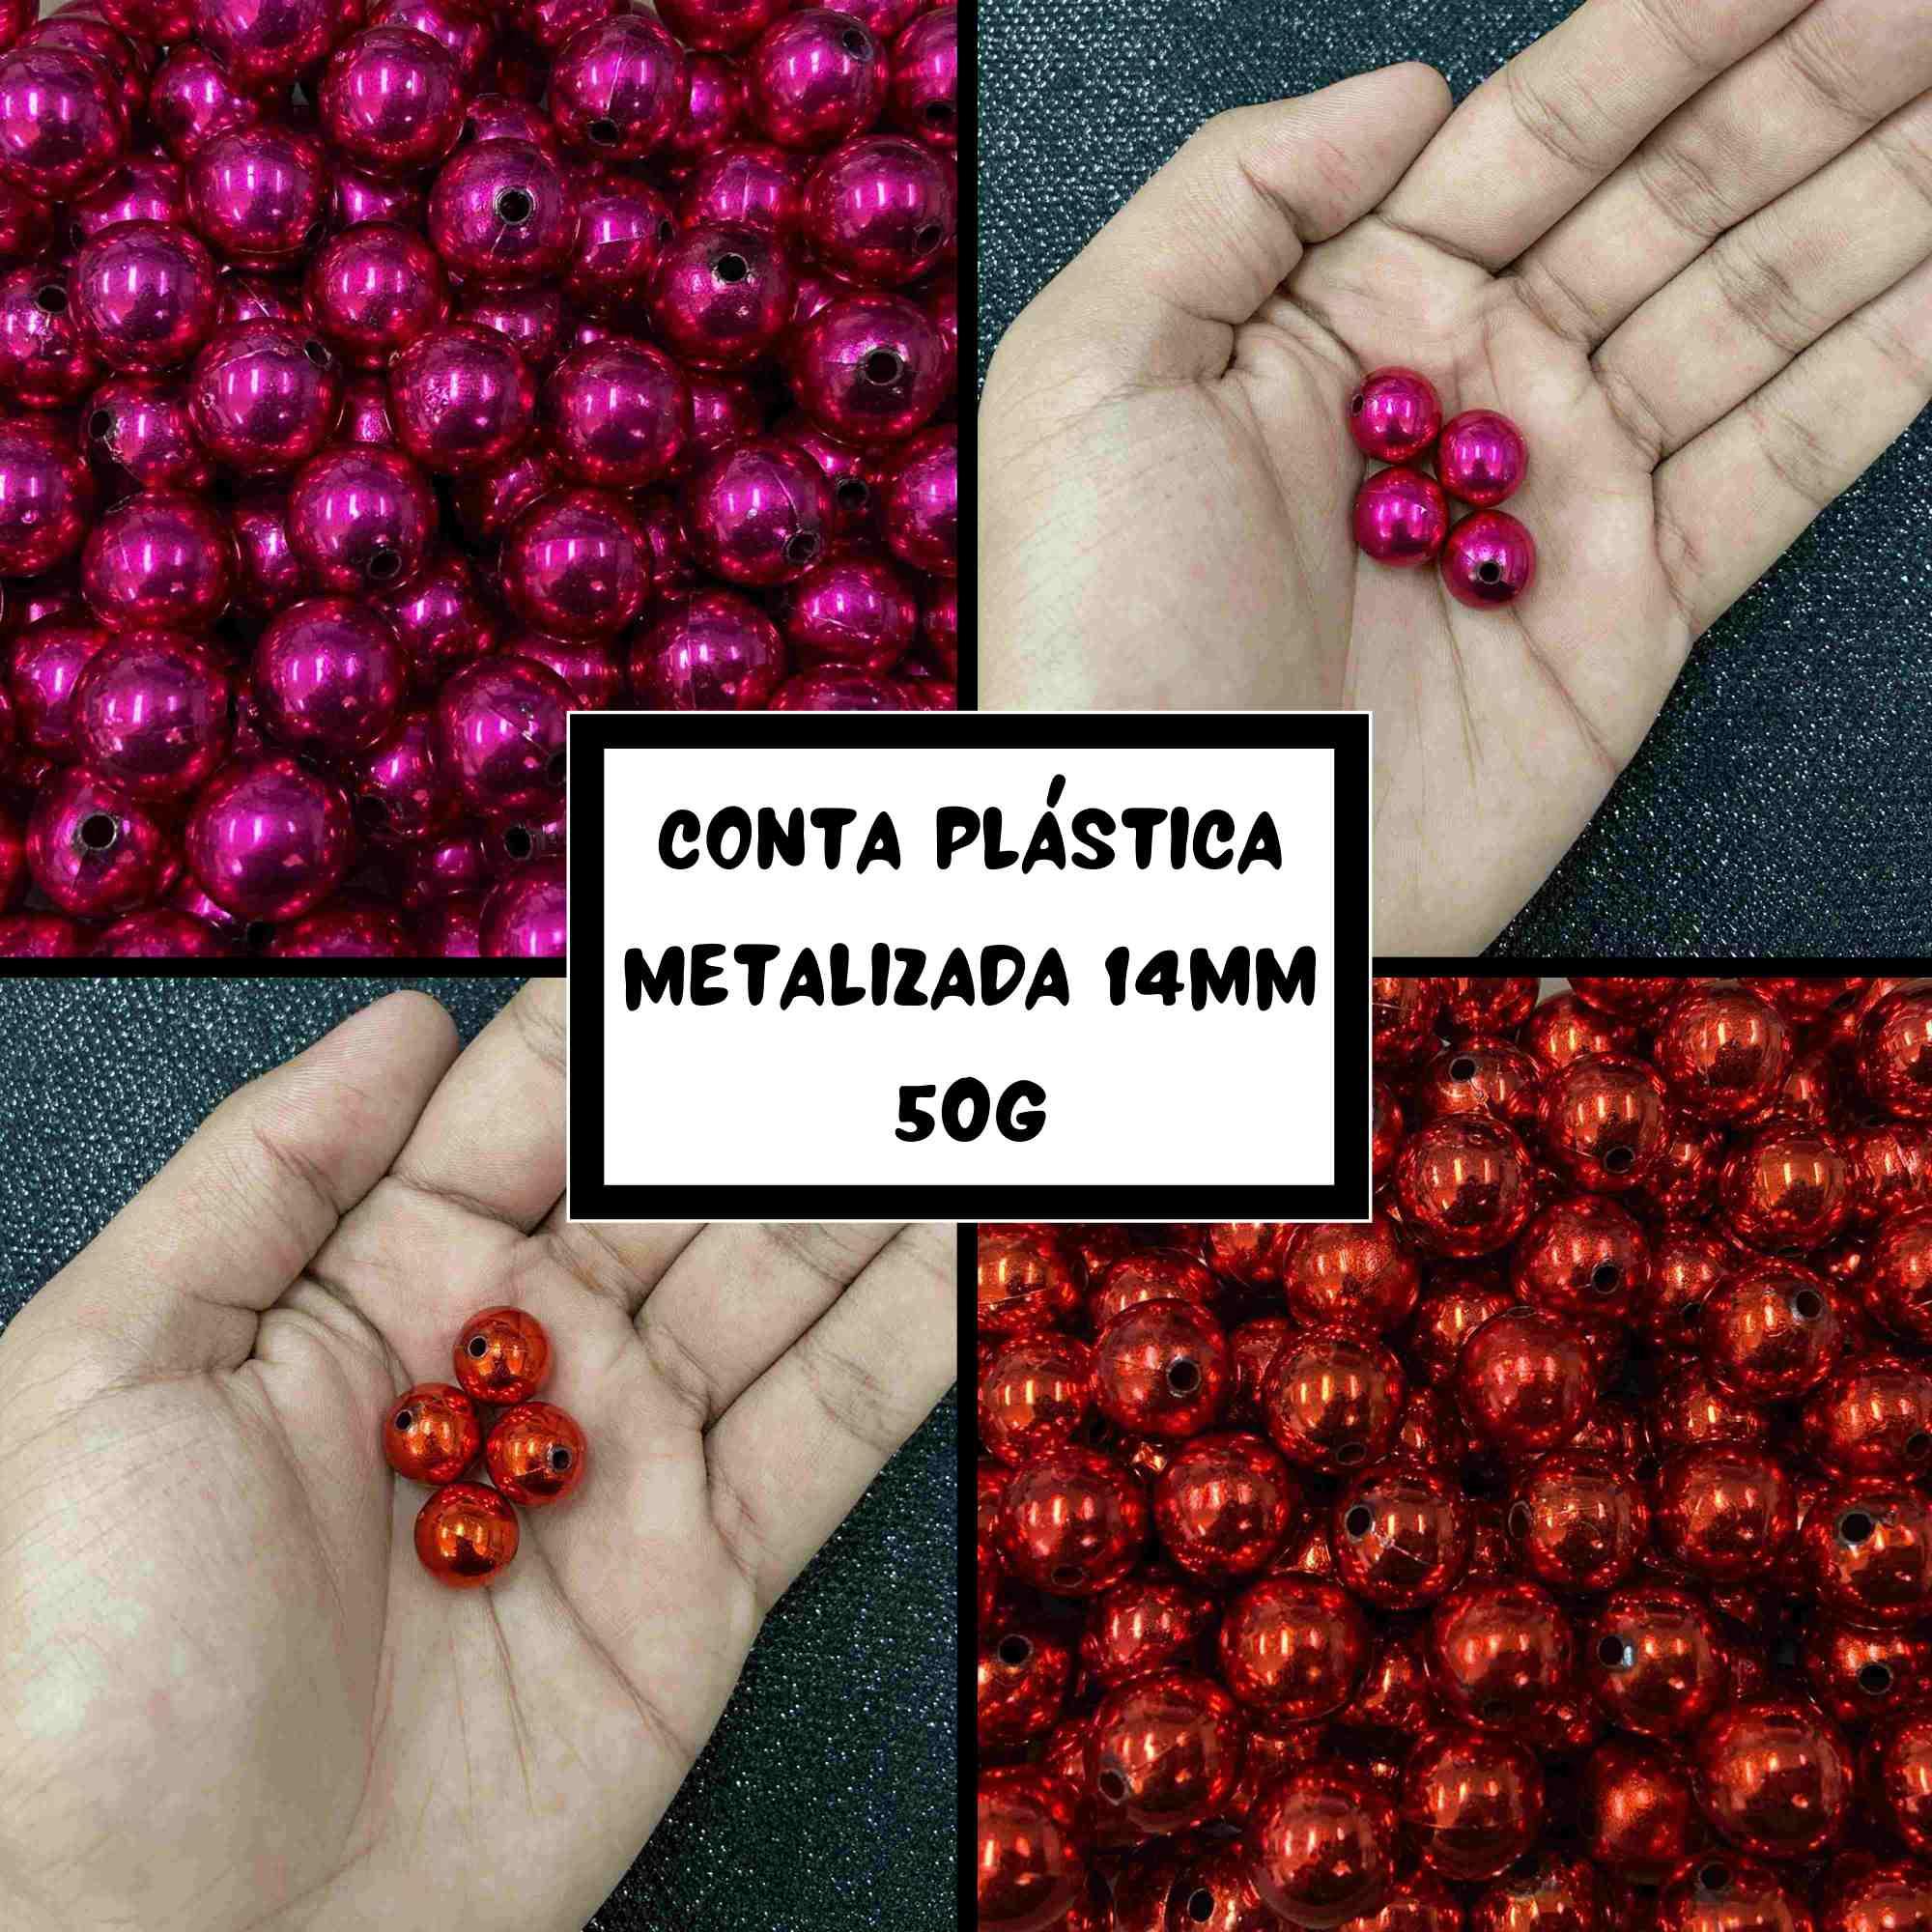 Conta Plástica Metalizada 14mm - 50g